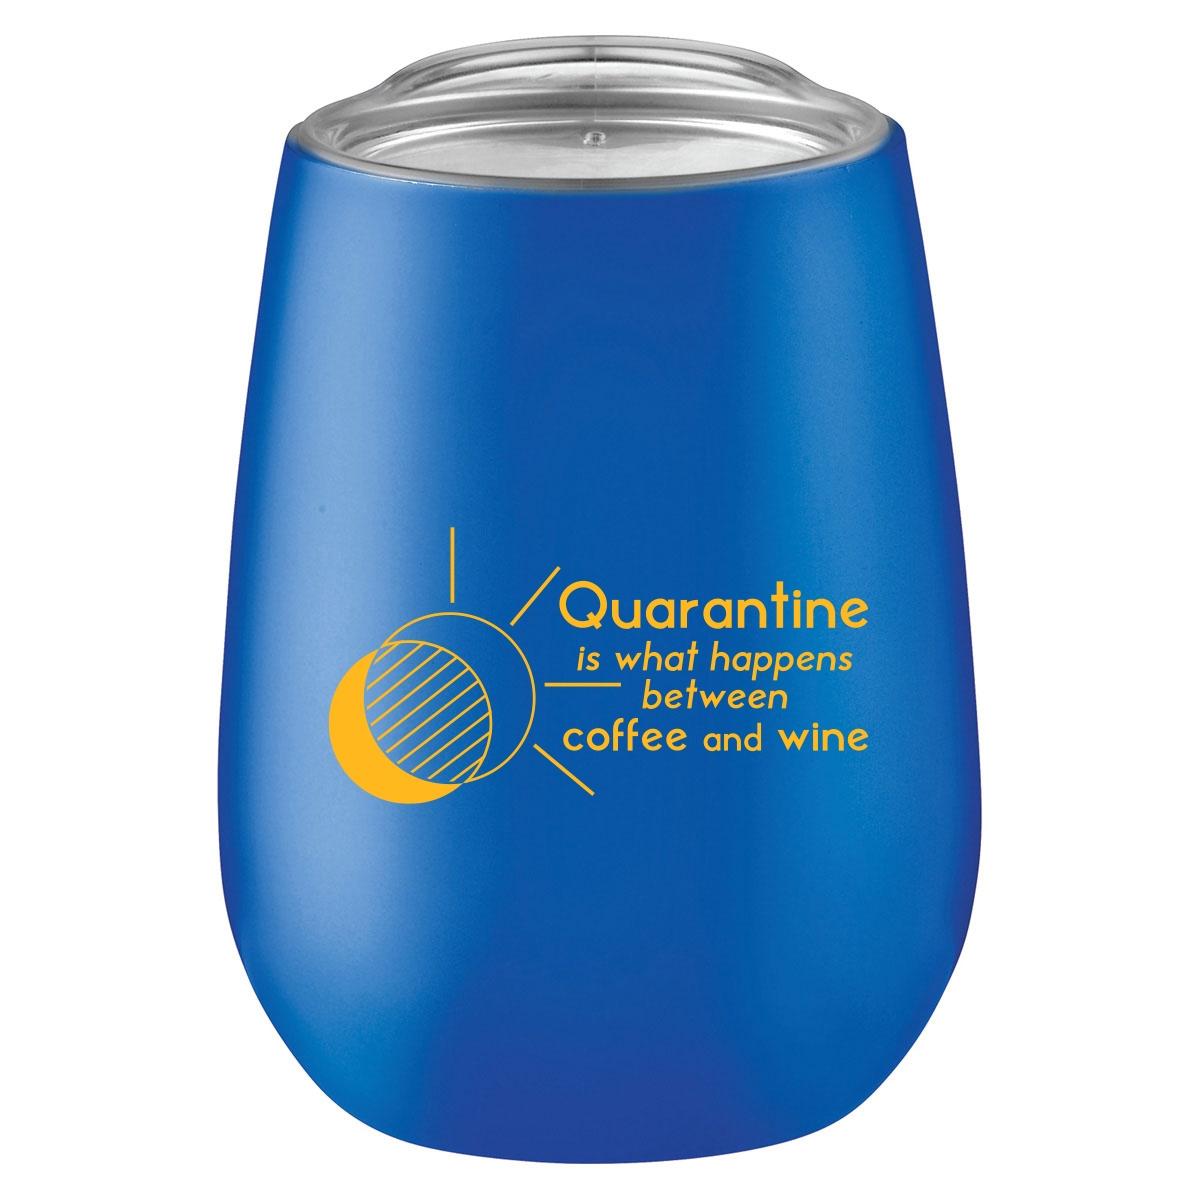 Funny quarantine quote on coffee mug